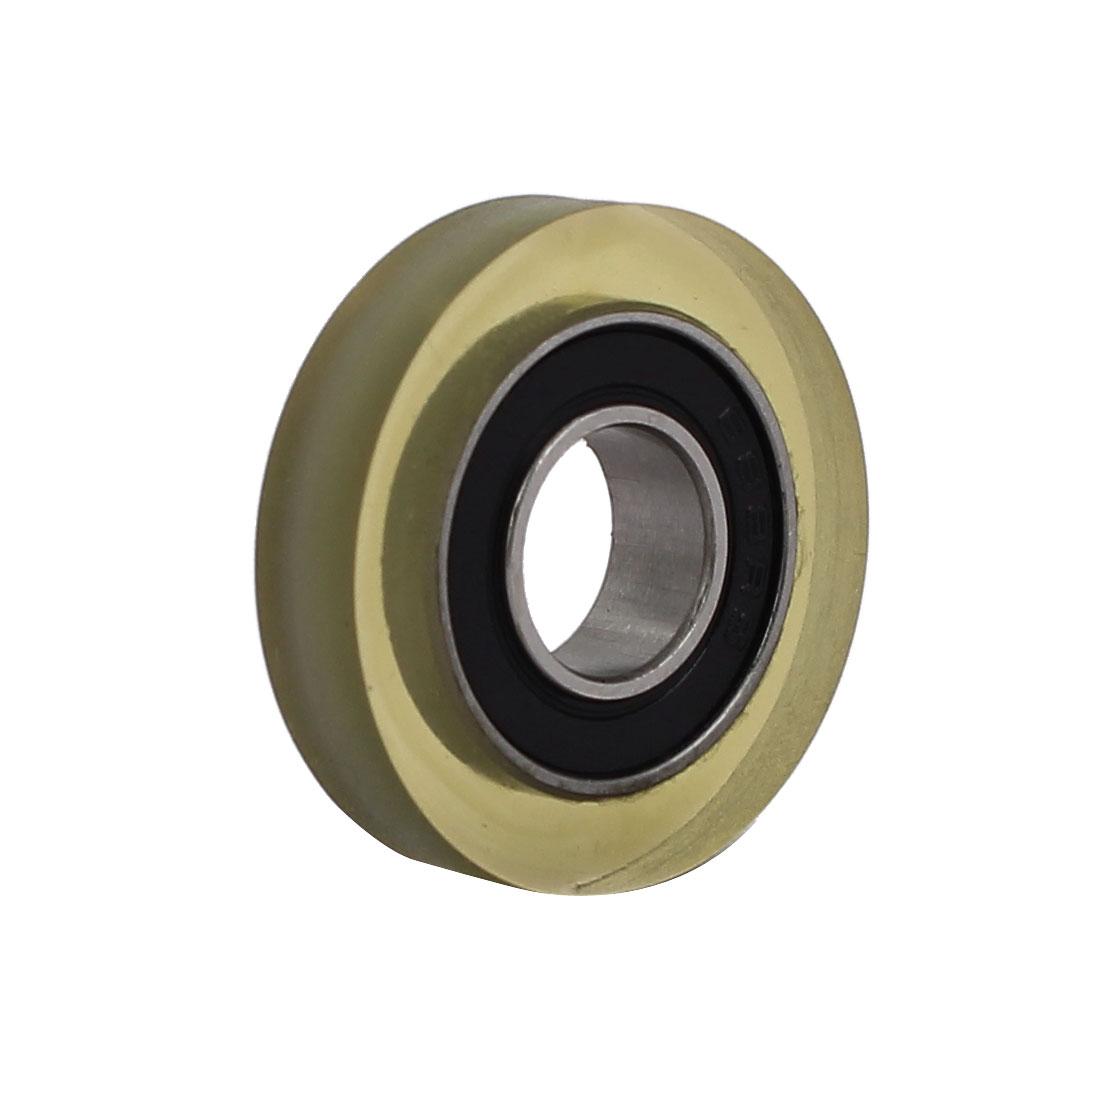 8mm x 22mm x 5mm PU Roller Bearing Pulley Sliding Converyor Wheel